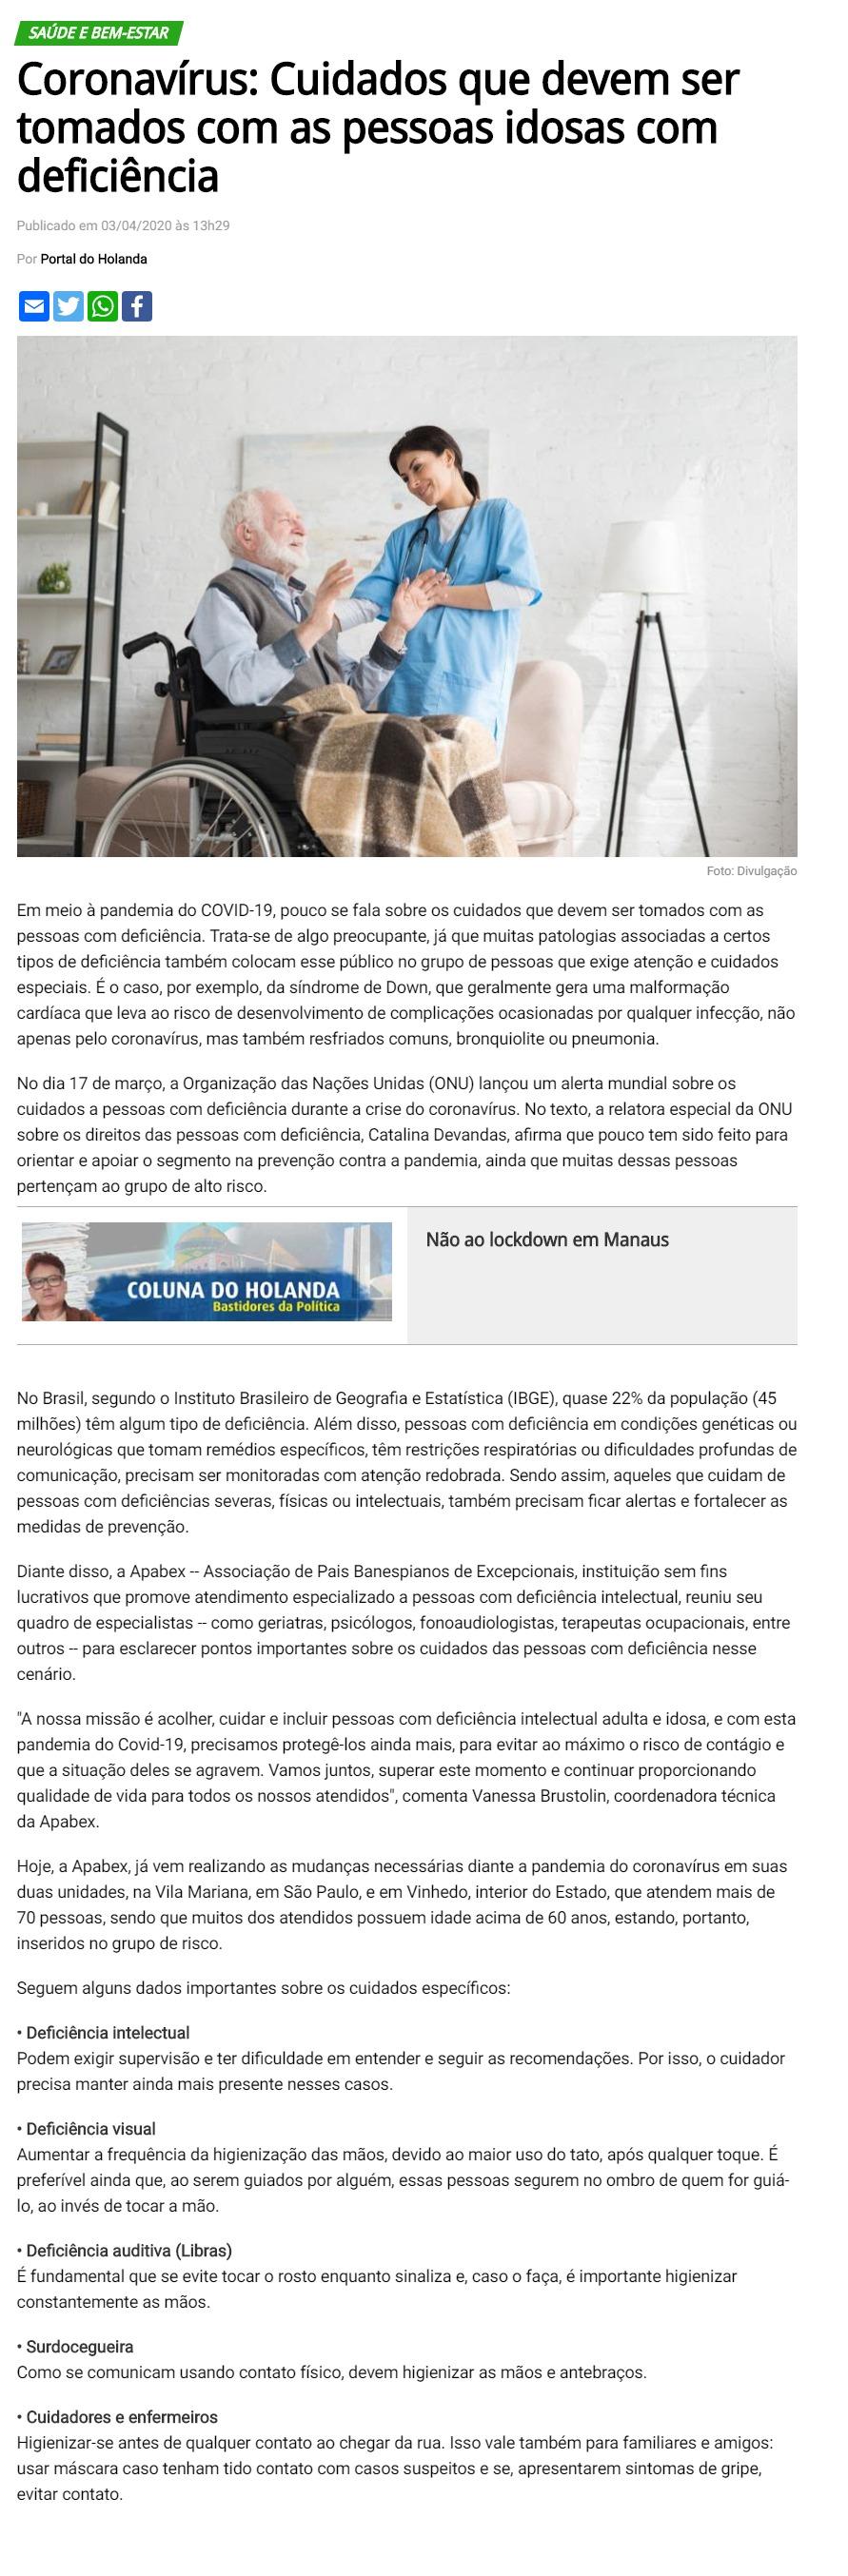 APABEX - Portal de Holanda